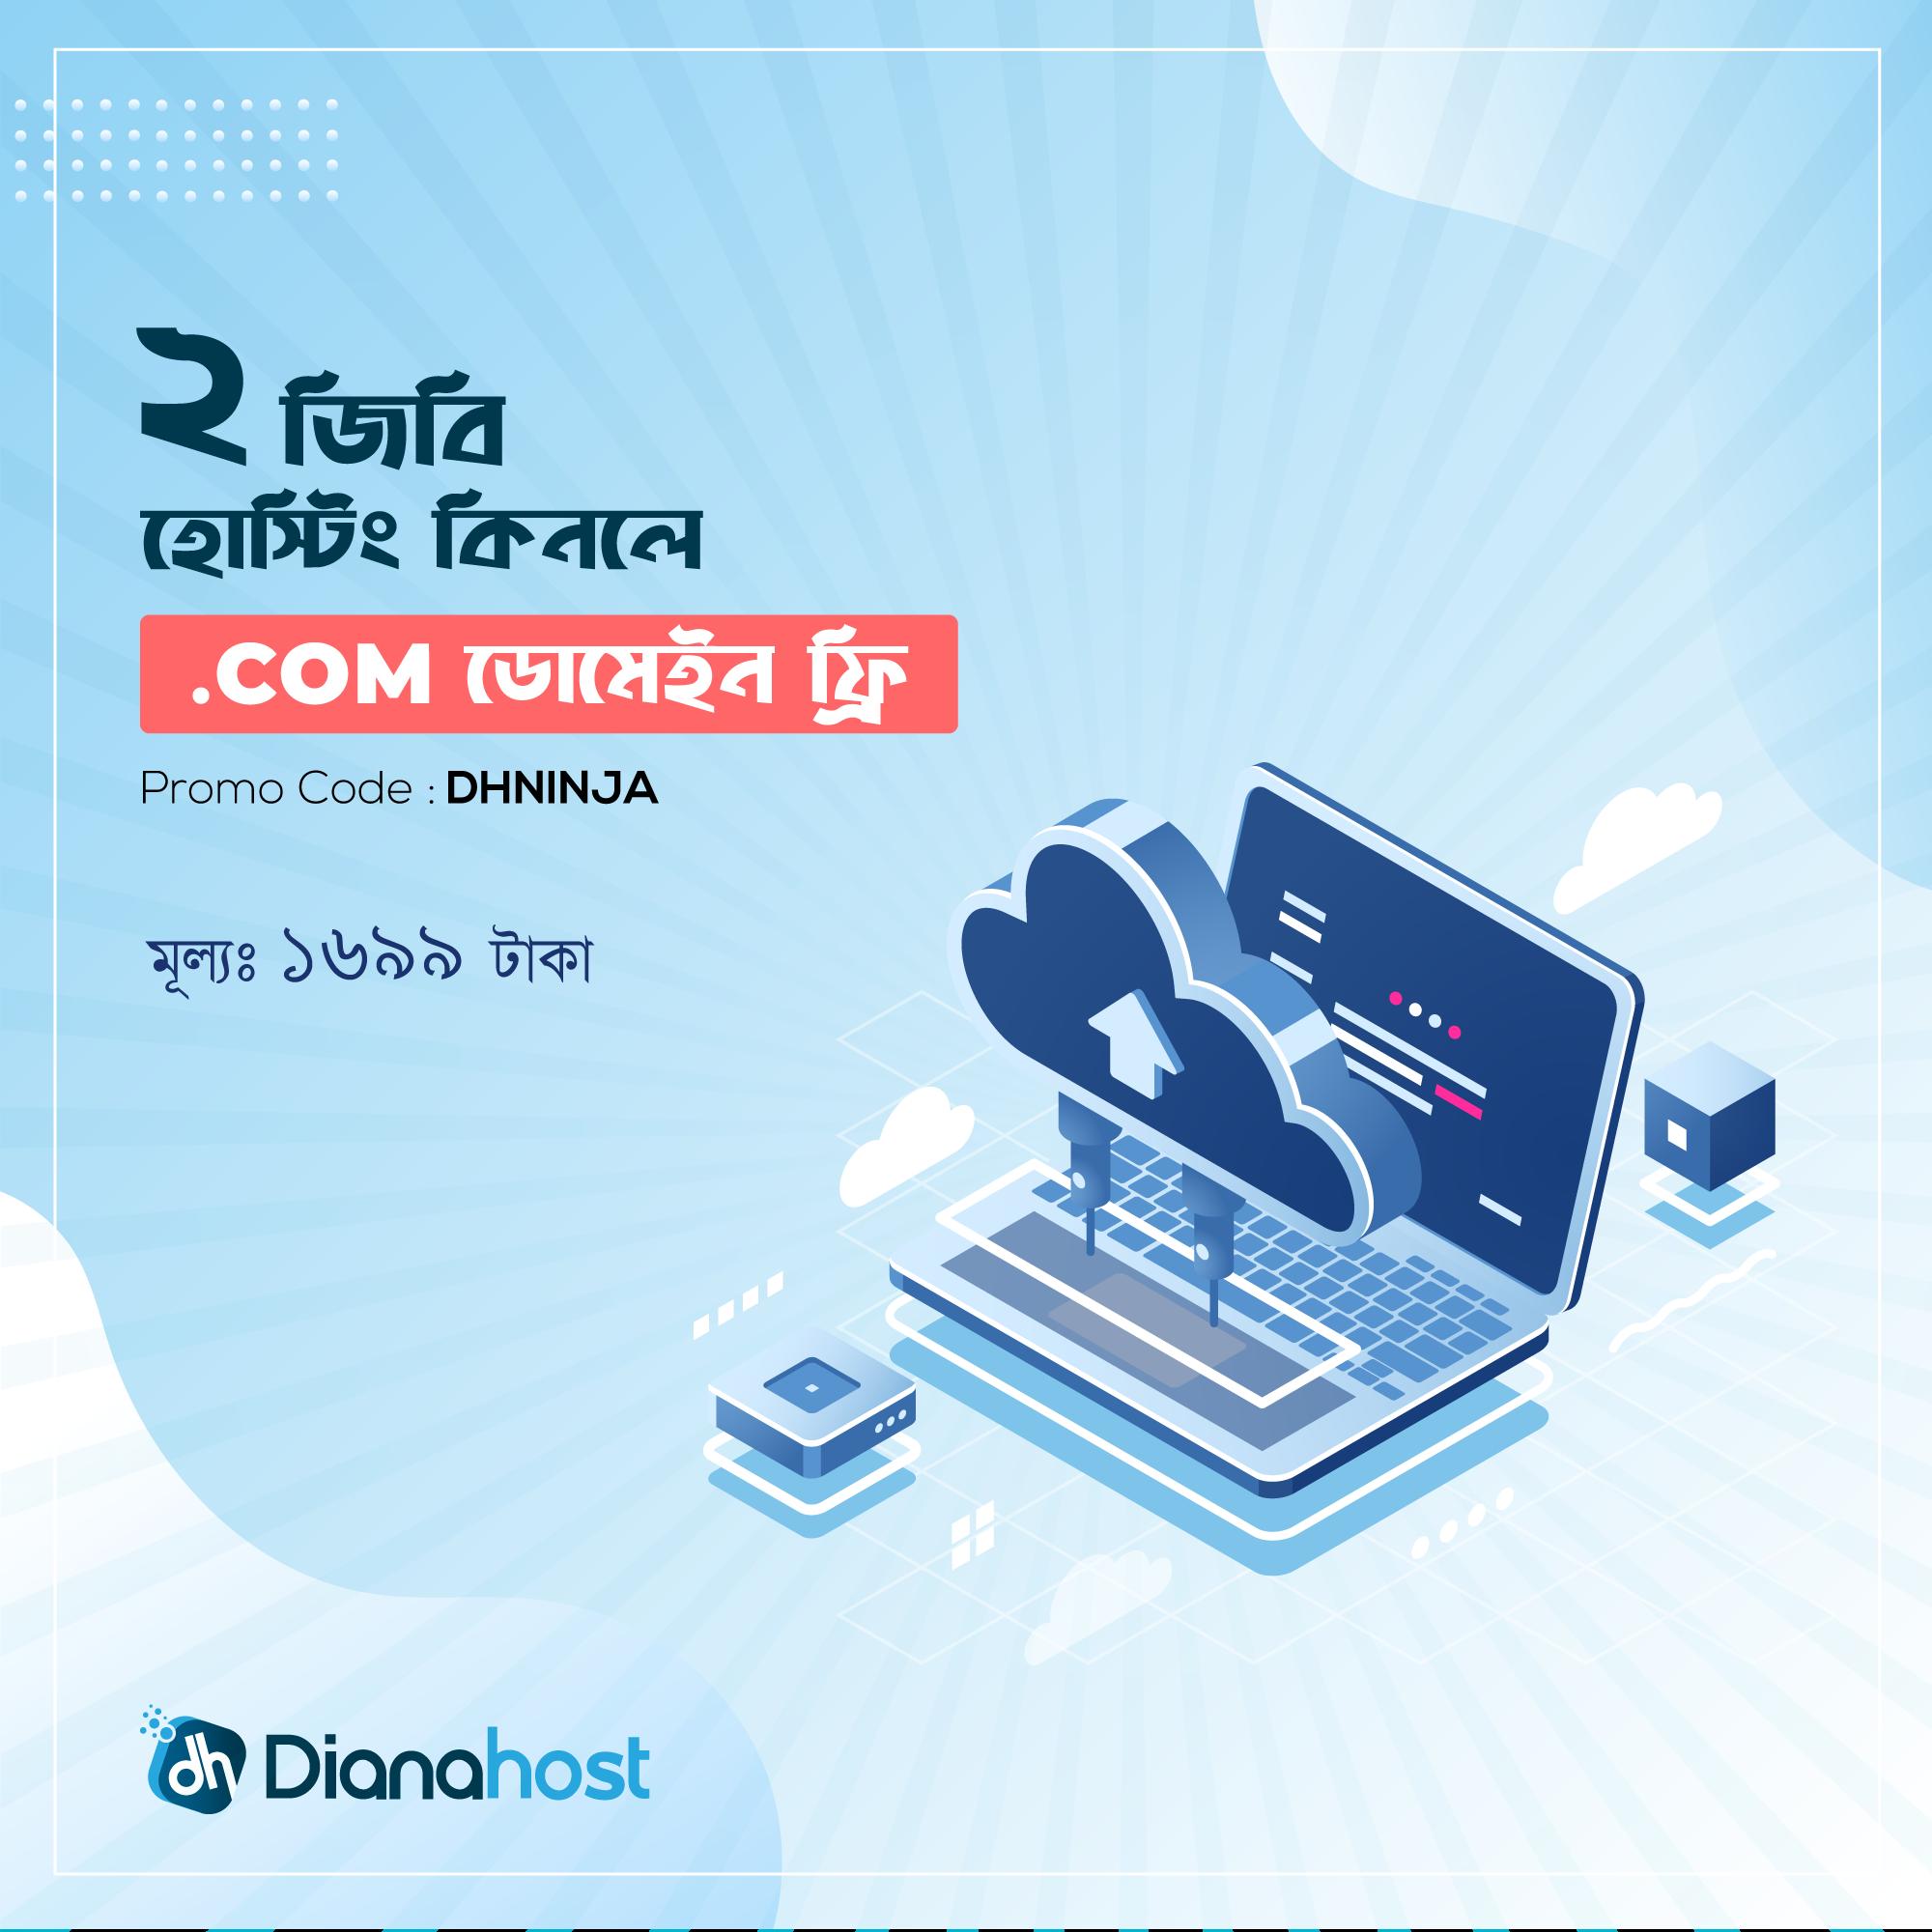 buy 2gb hosting get .com domain free, dianahost offer, best web hosting company bangladesh